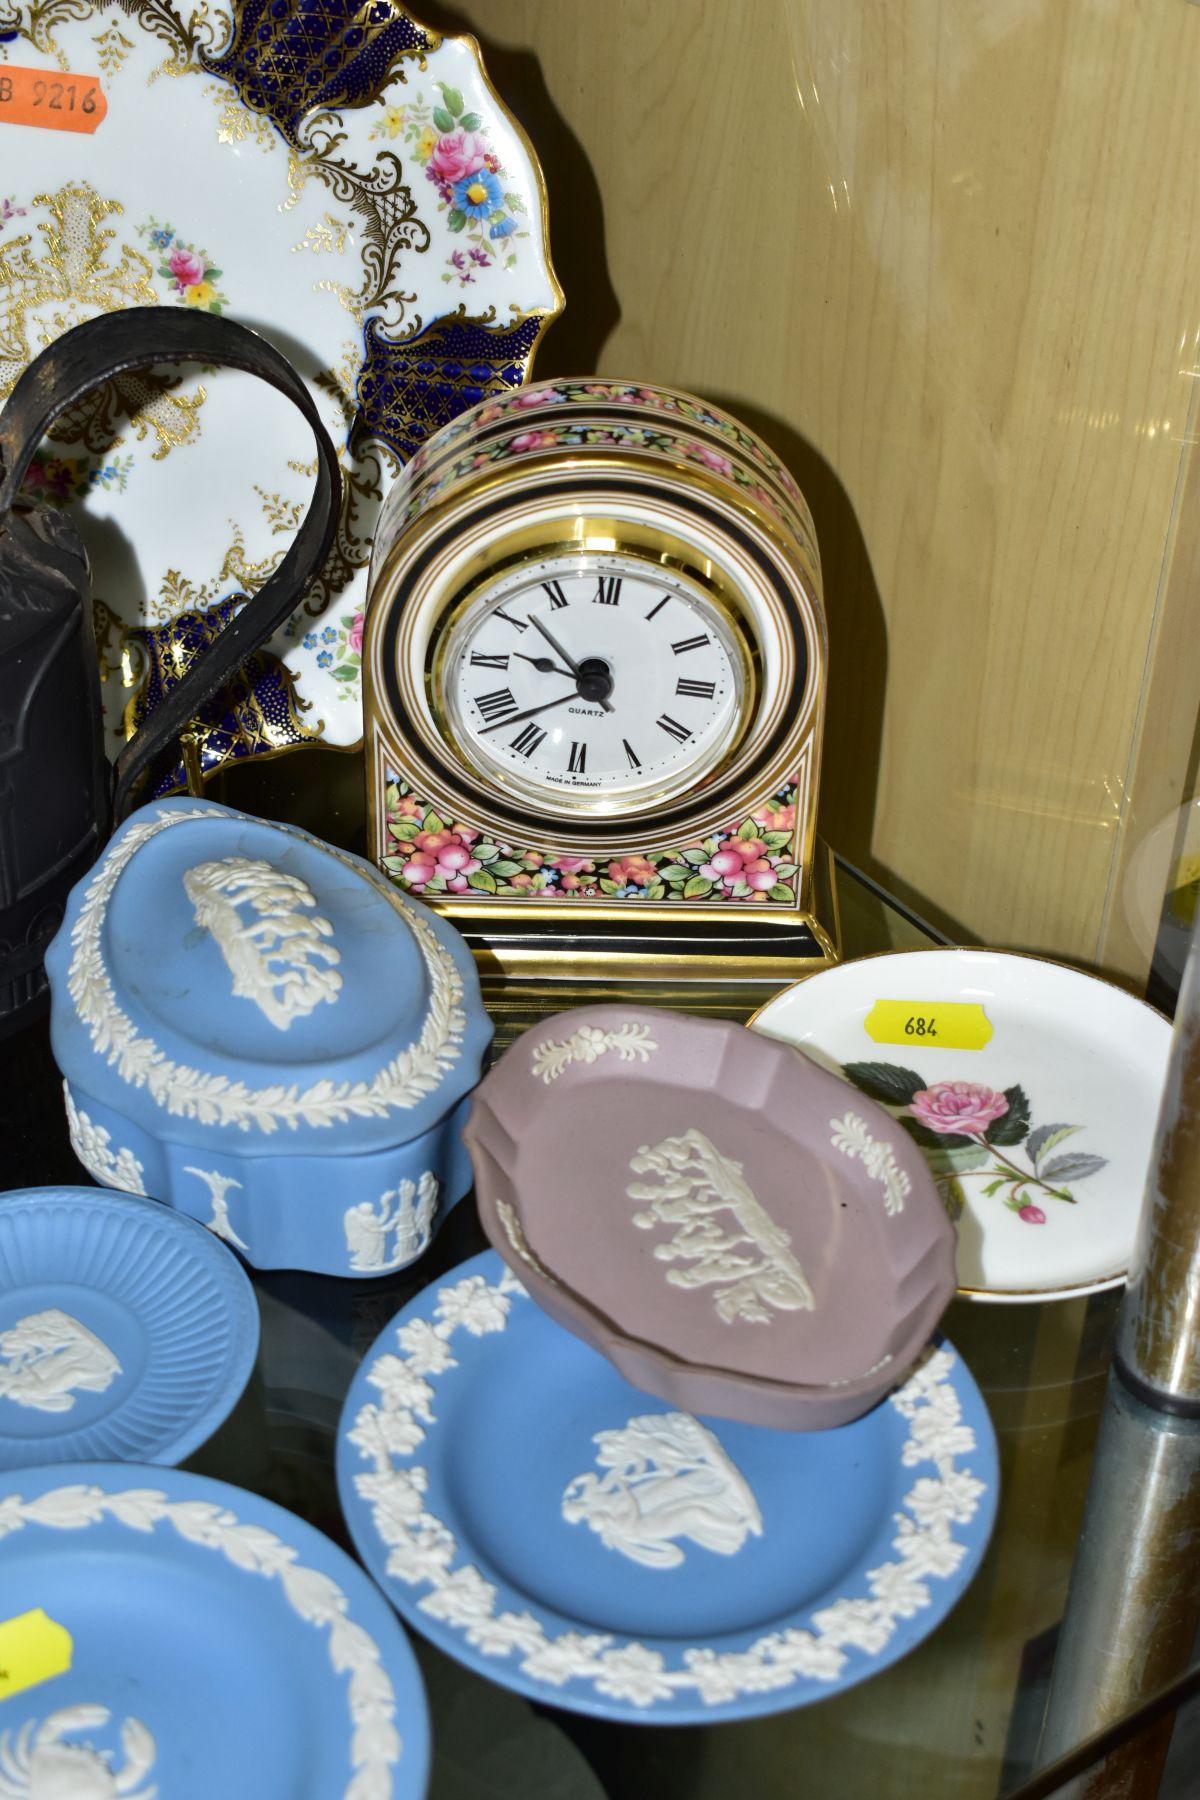 CERAMICS to include blue jasper ware trinkets, etc, Wedgwood Clio clock, black basalt teapot with - Image 2 of 8